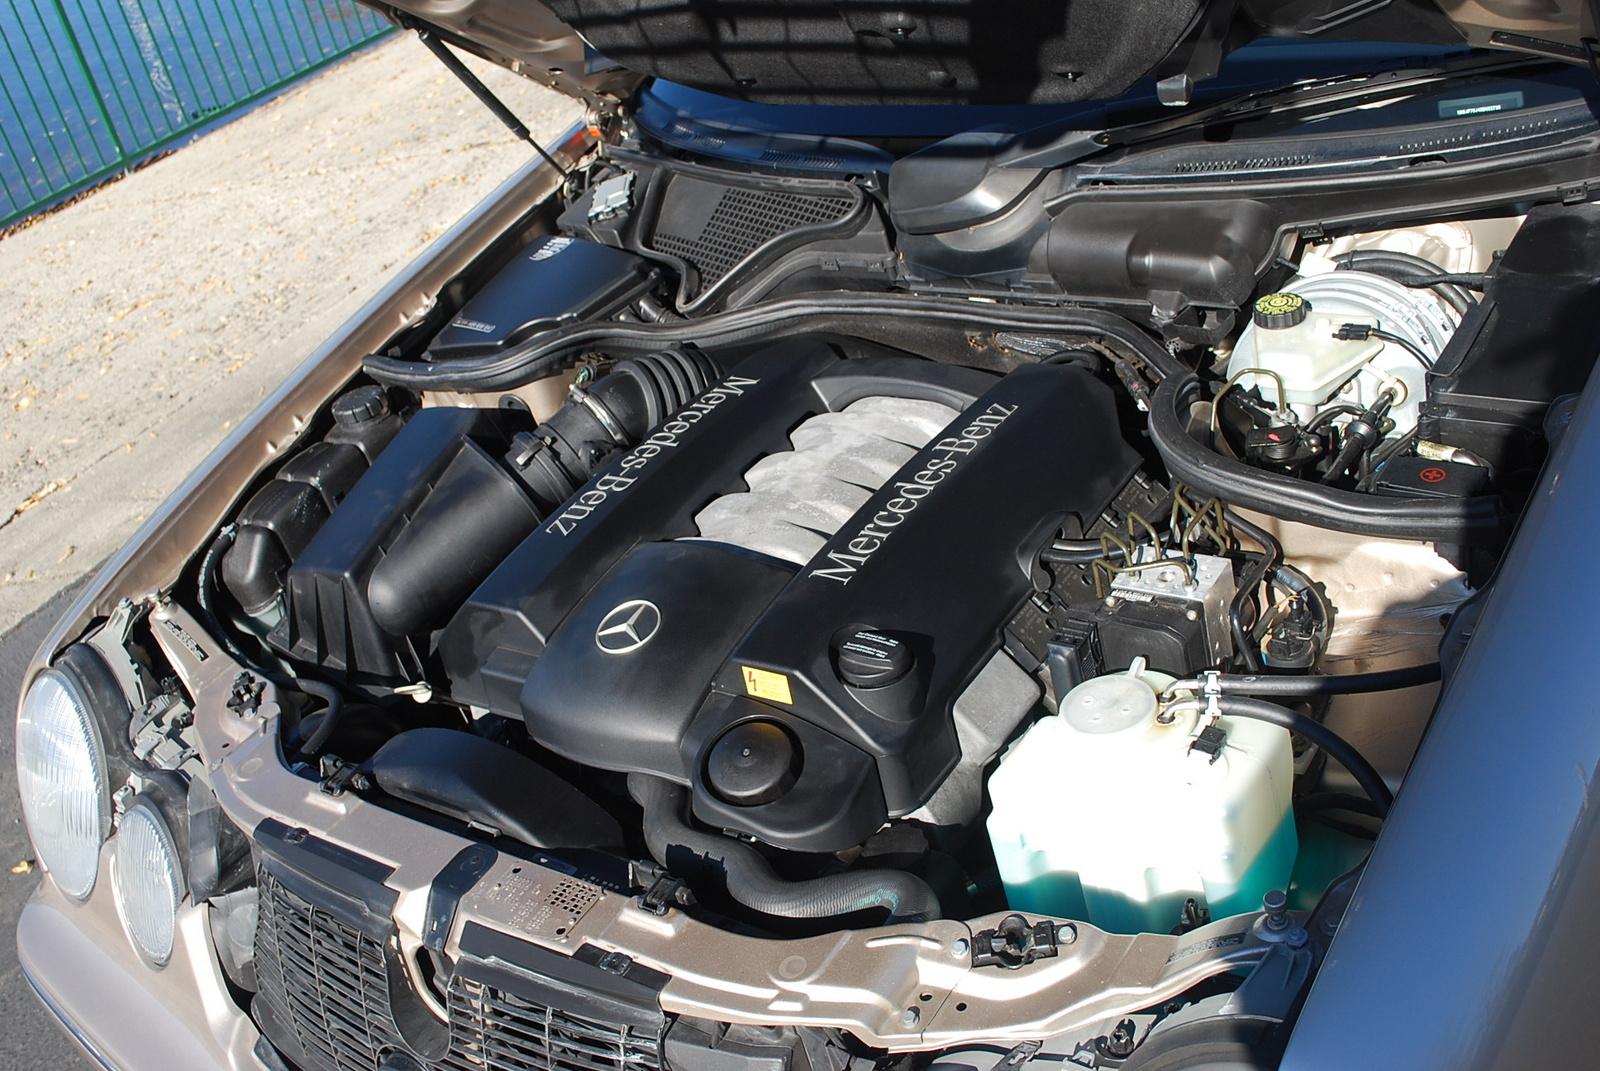 2002 mercedes benz e class pictures cargurus for Mercedes benz e320 engine